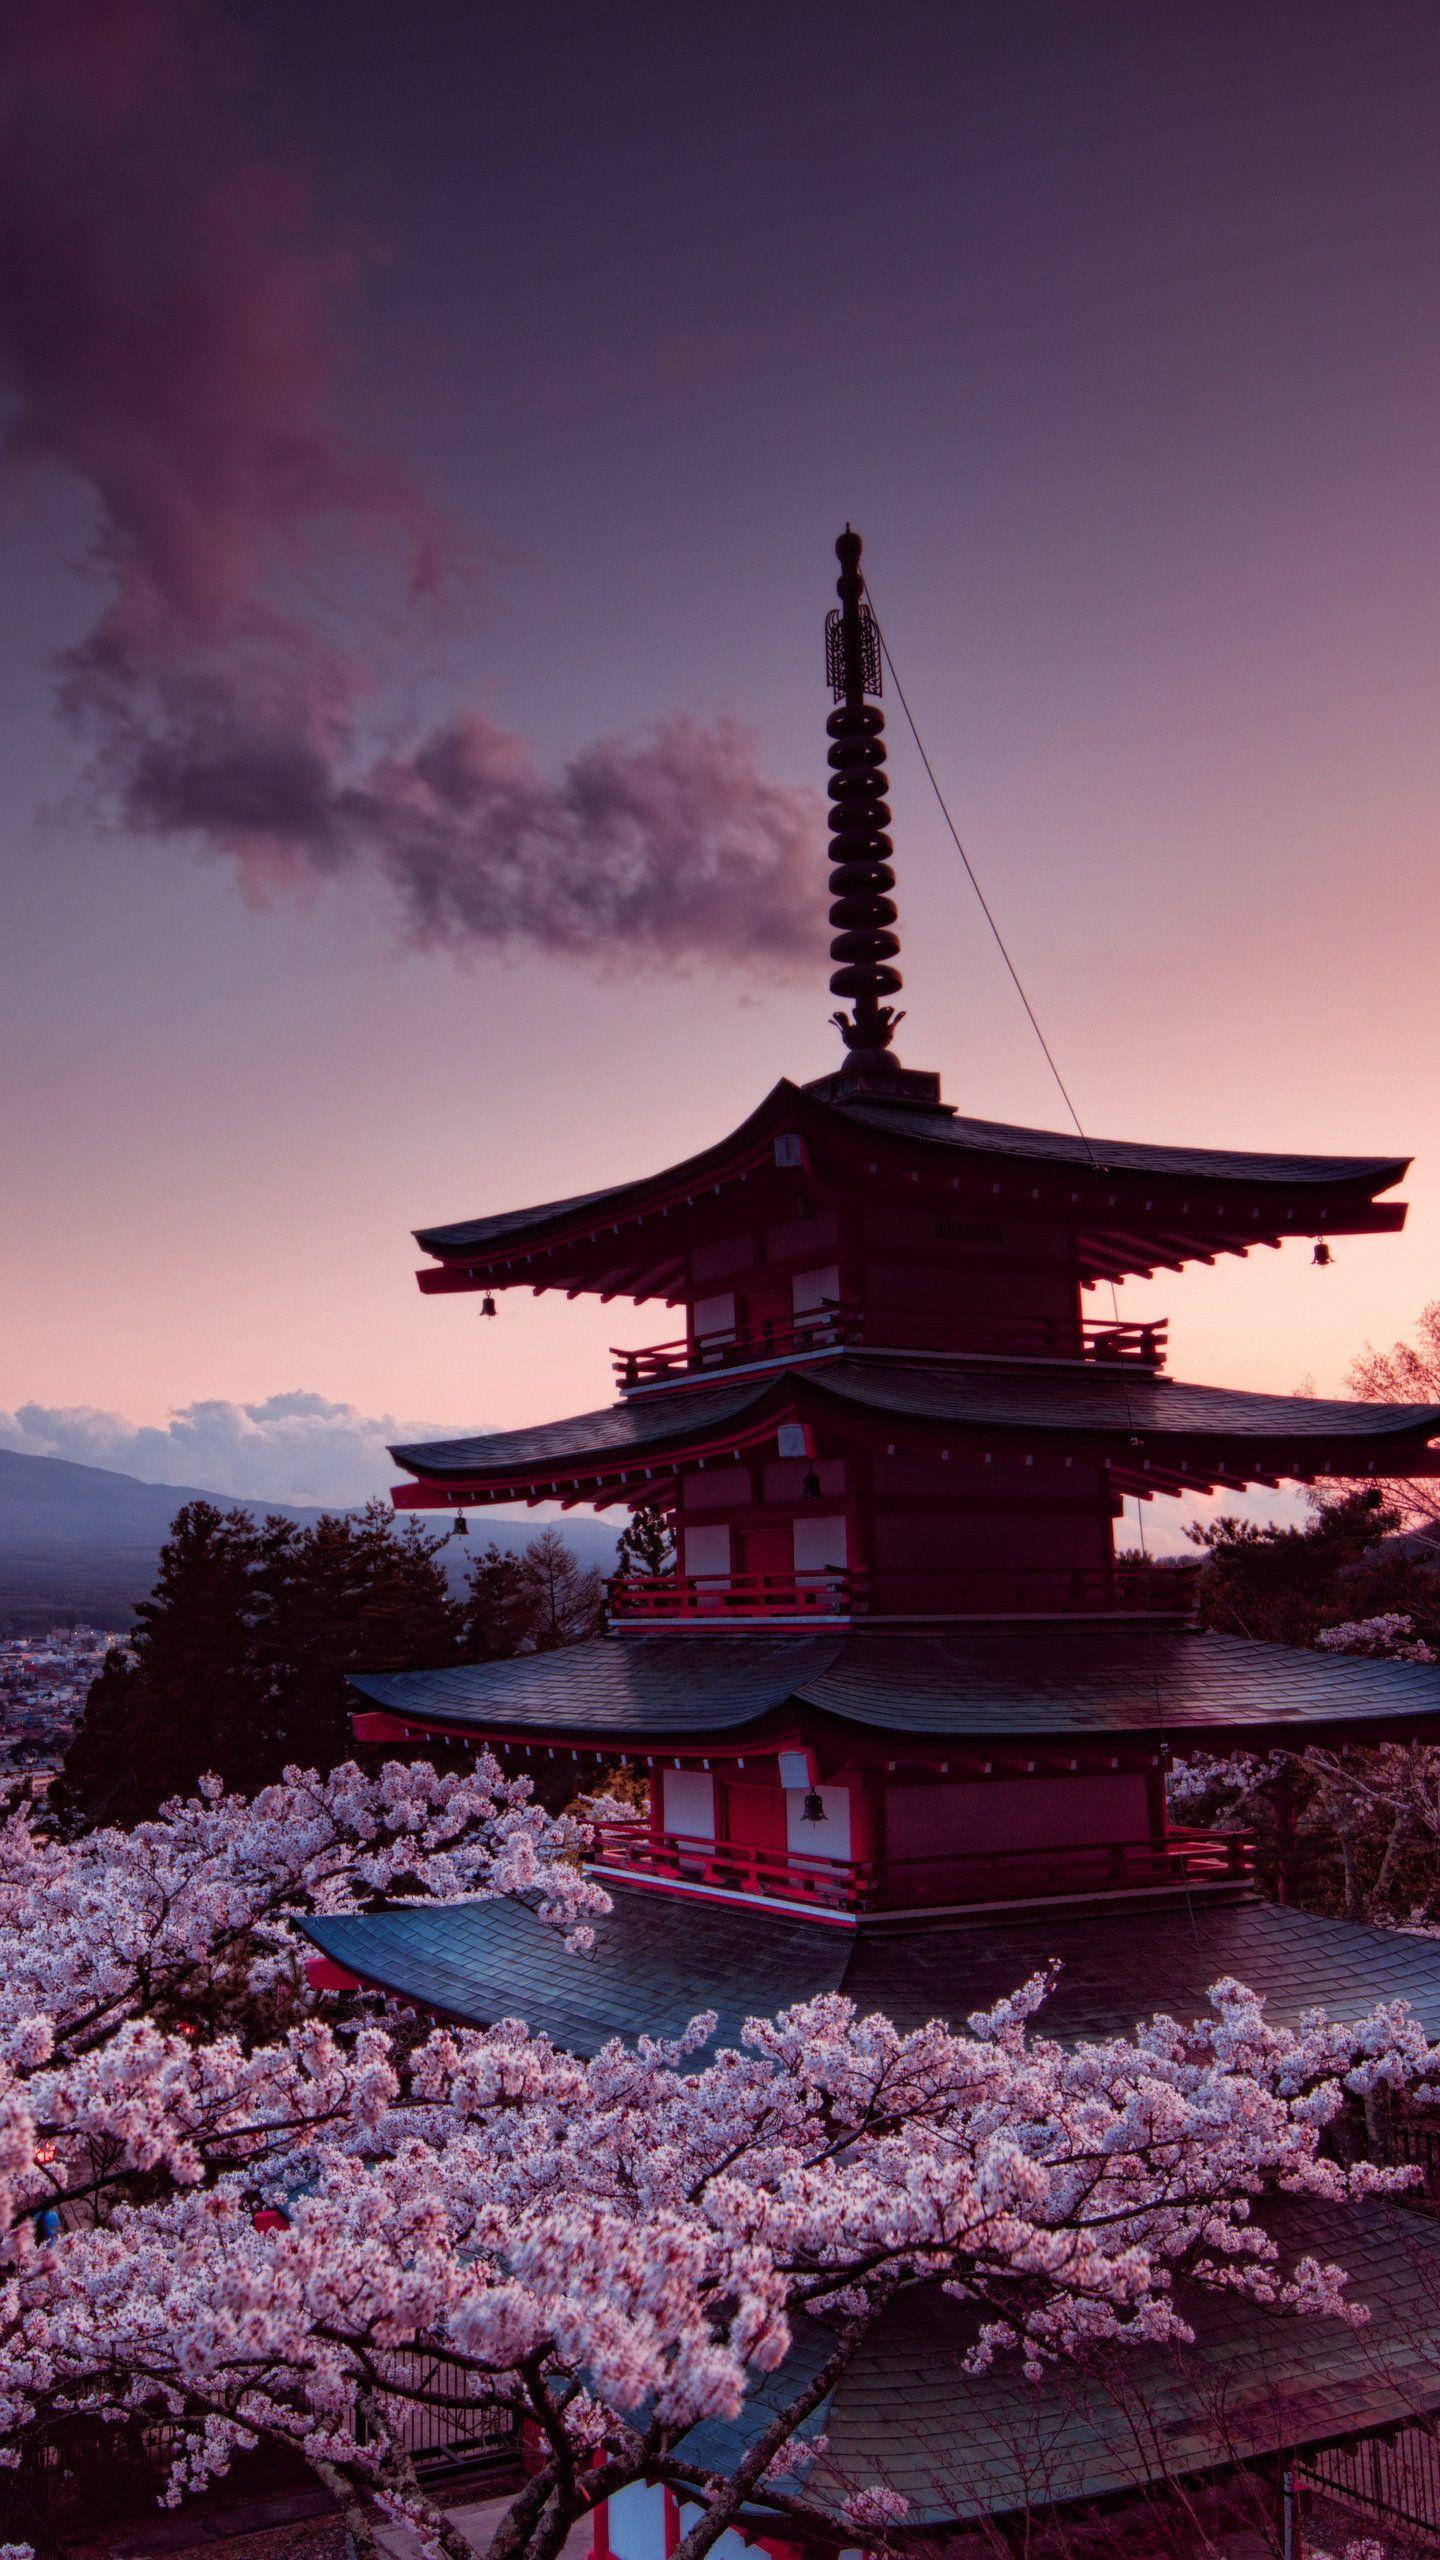 Churei Tower Mount Fuji In Japan 8k Hd Wallpaper 1440x2560 In 2020 Hd Nature Wallpapers Iphone Wallpaper Japan Iphone Wallpaper Stills